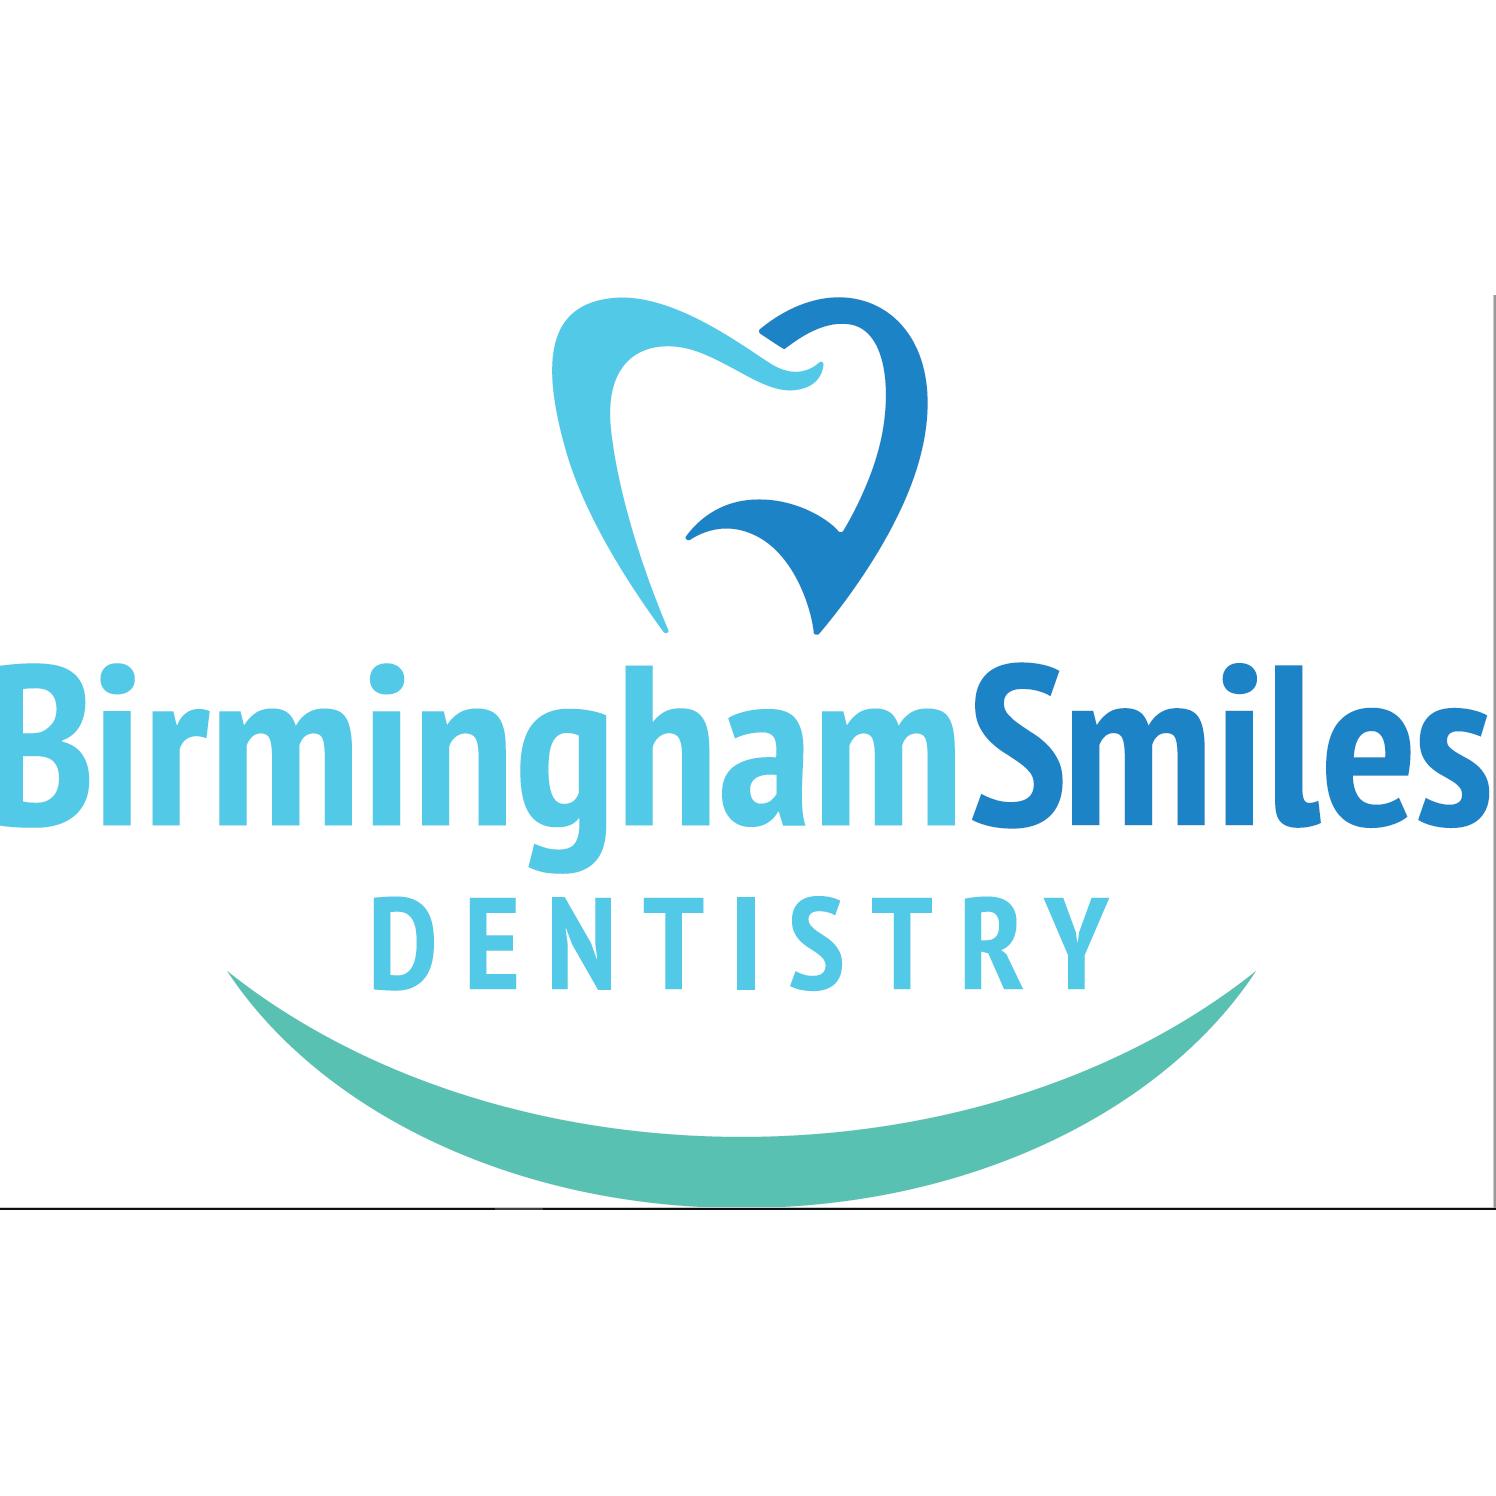 Birmingham Smiles Dentistry